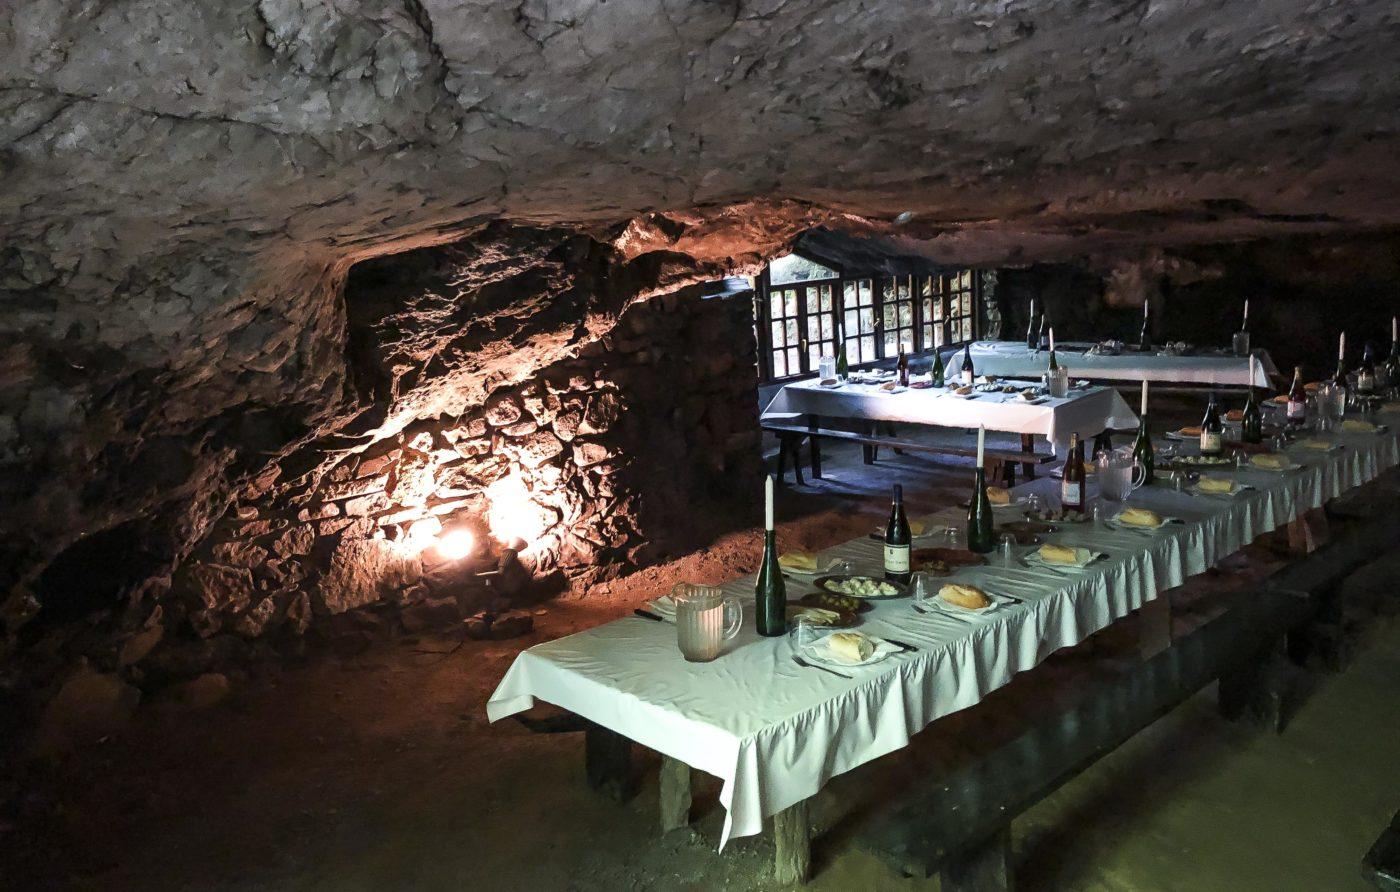 agence evenementielle pays basque erronda seminaire team building incentive event saint jean de luz rallye landes plein air ocean 2cv zikiro grottes agneau asado